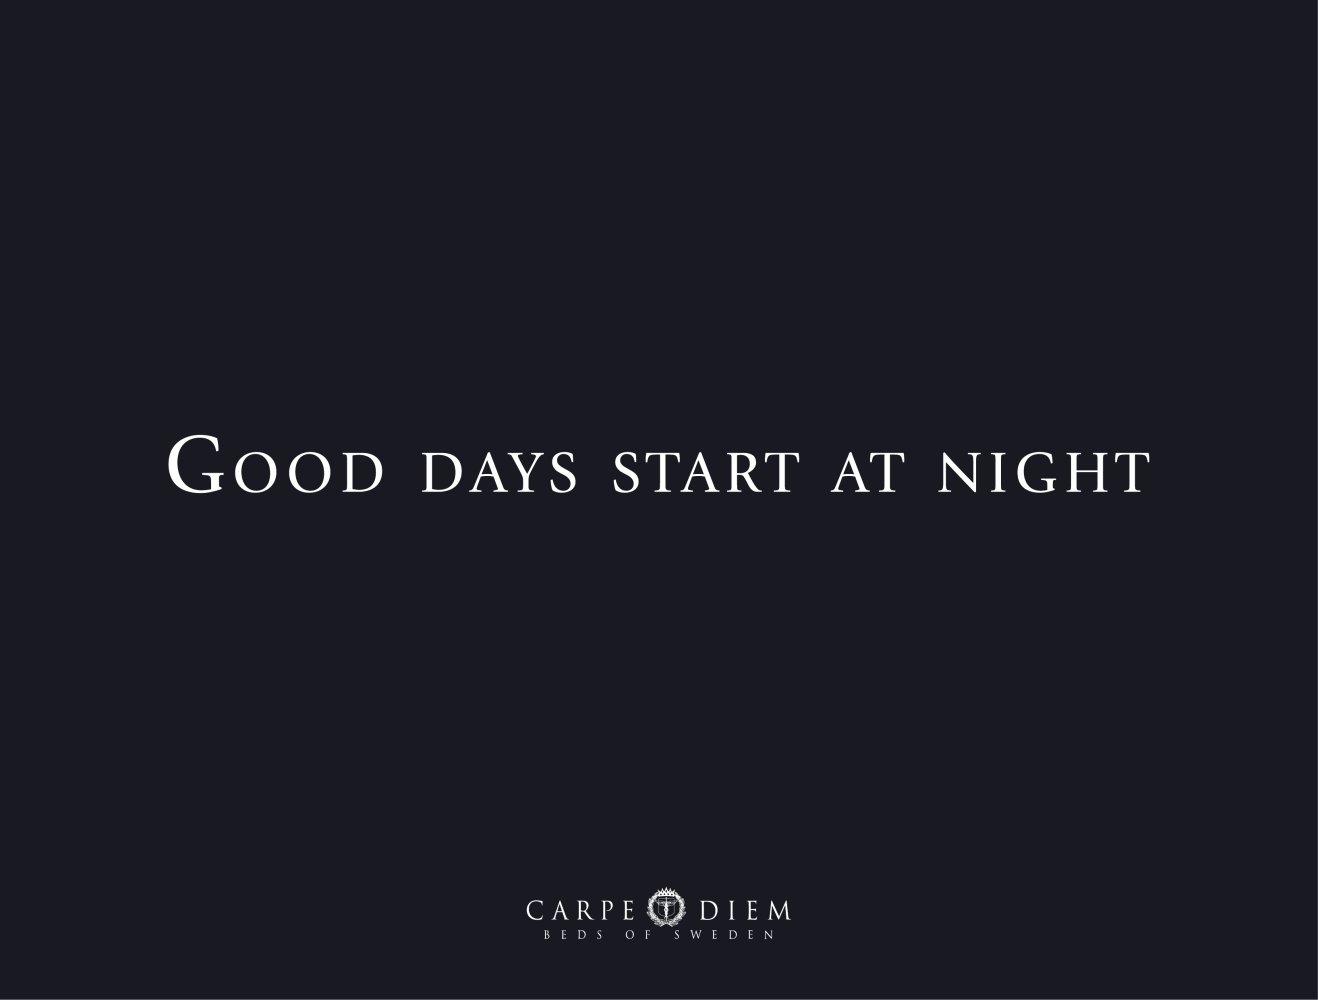 Good Days Start At Night Carpe Diem Pdf Catalogs Documentation